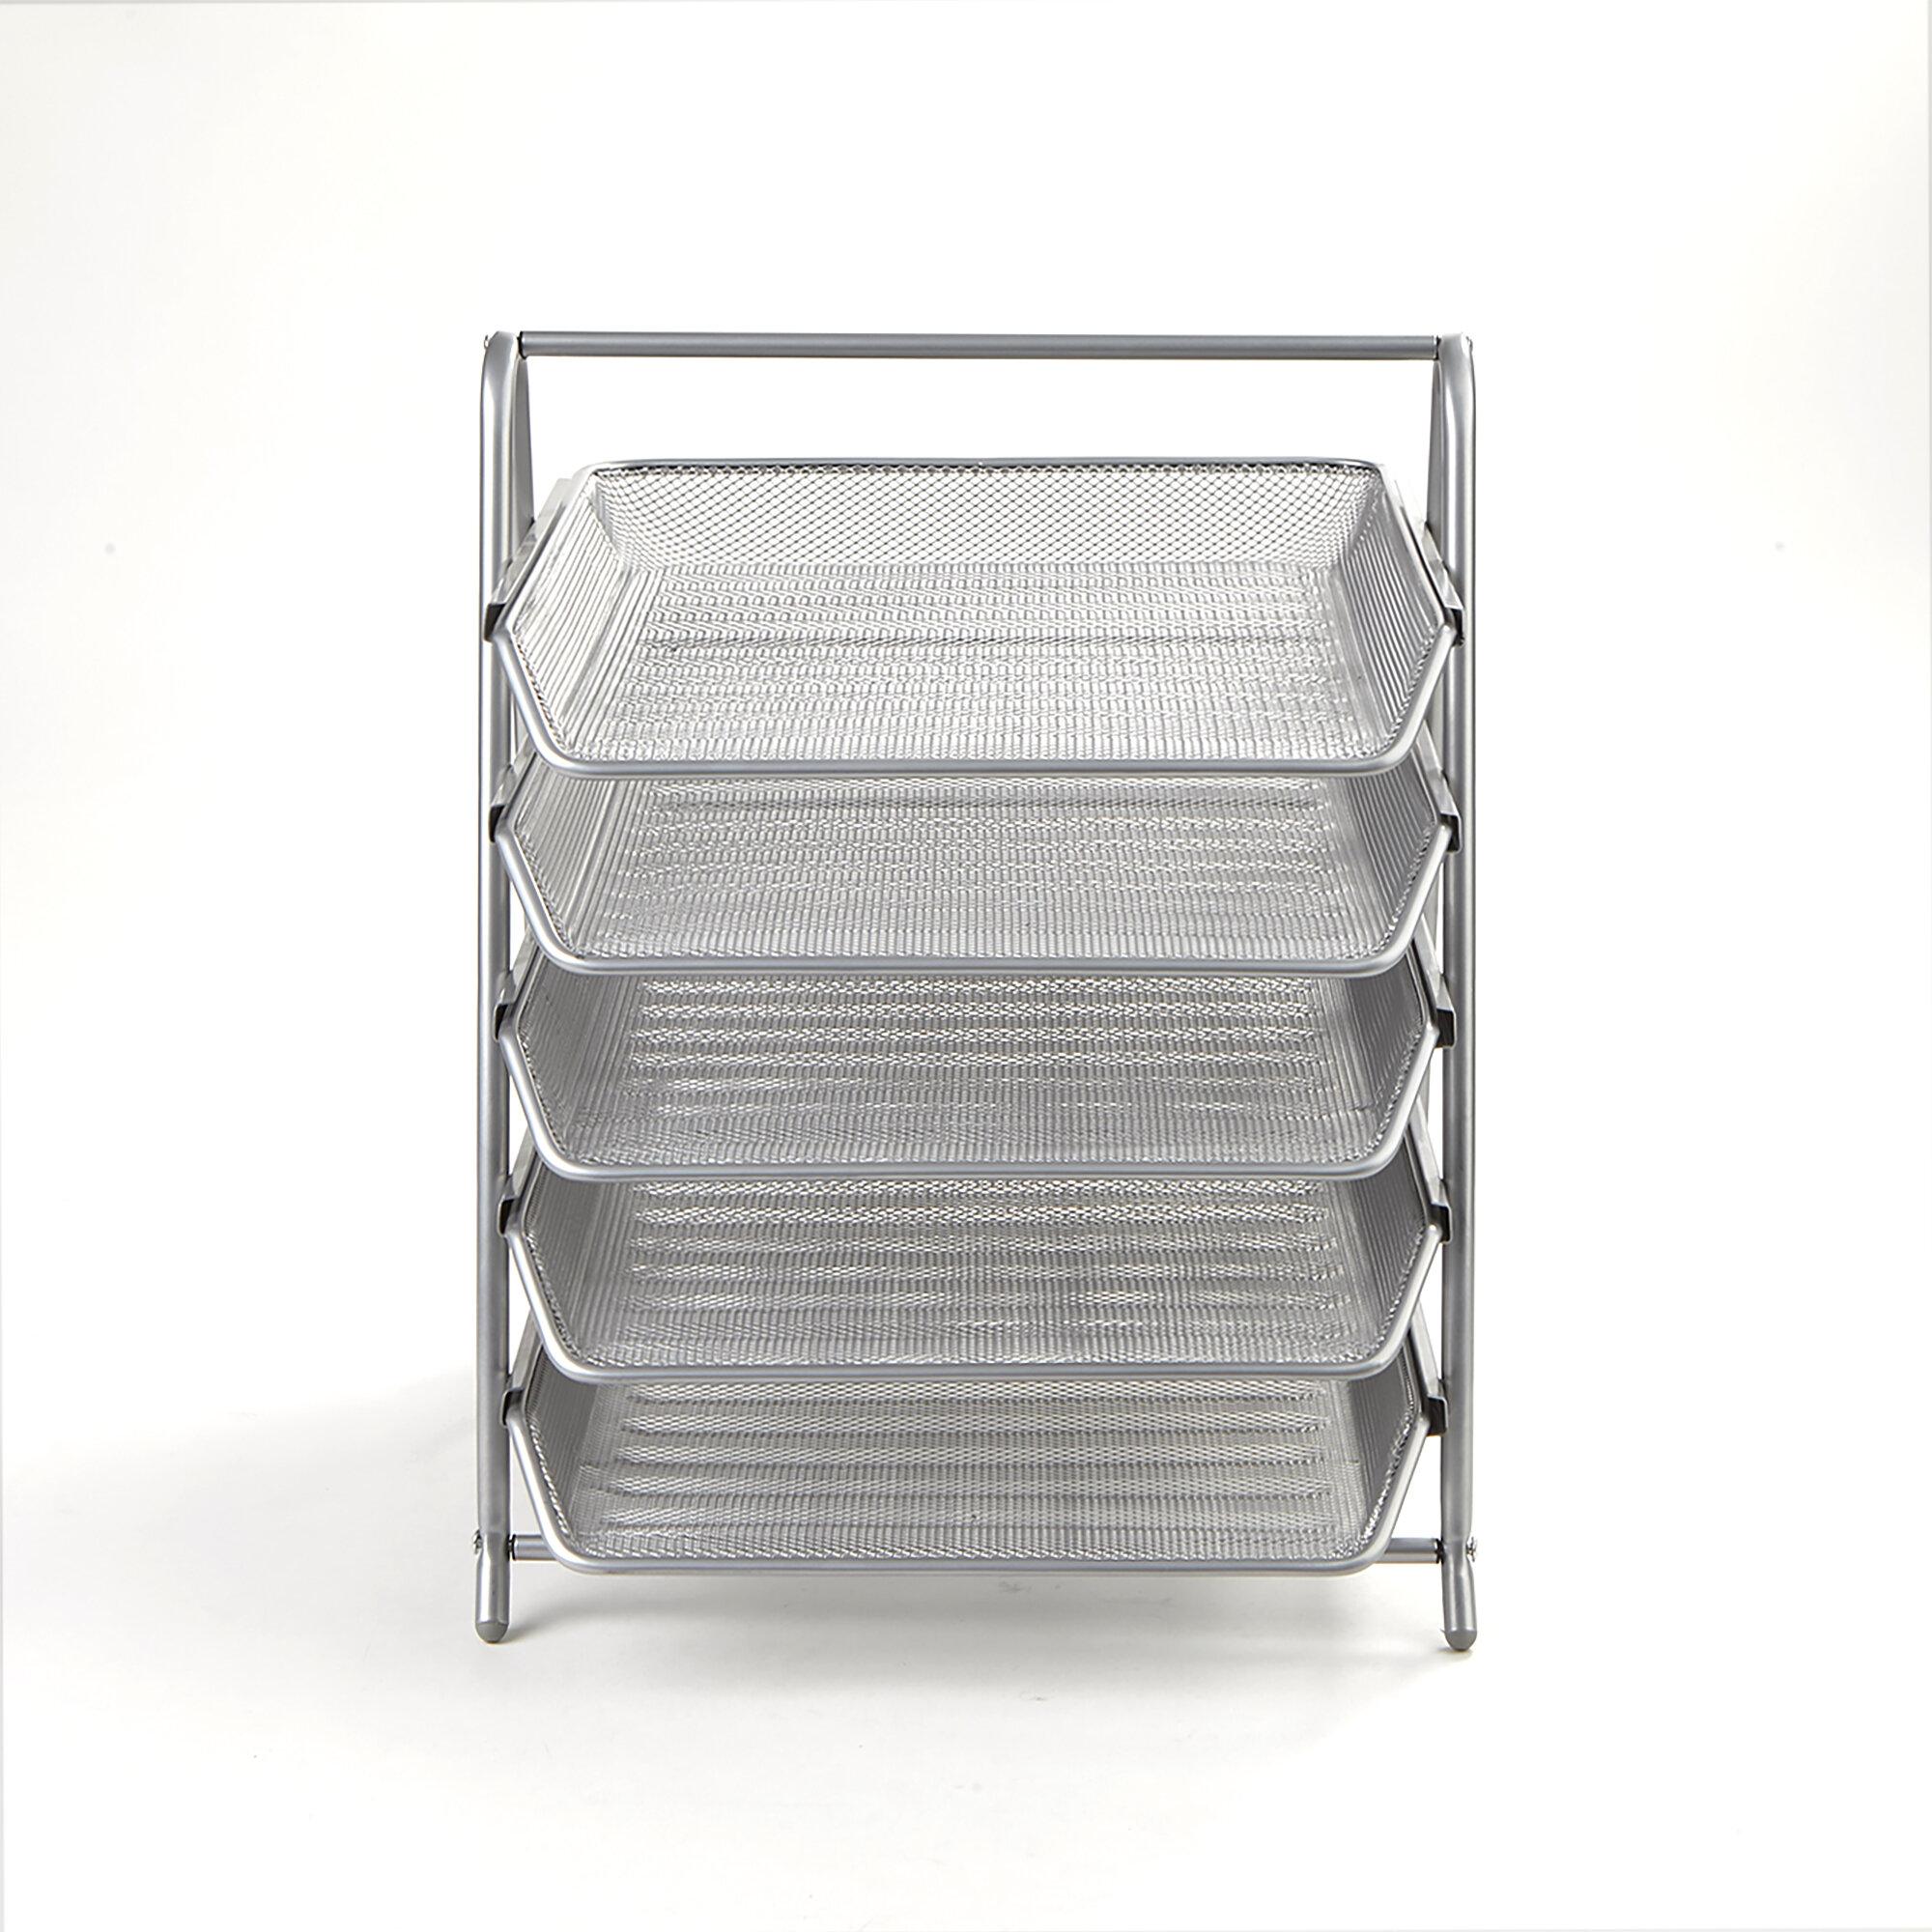 Miraculous 5 Tier Steel Mesh Paper Tray Desk Organizer Download Free Architecture Designs Scobabritishbridgeorg